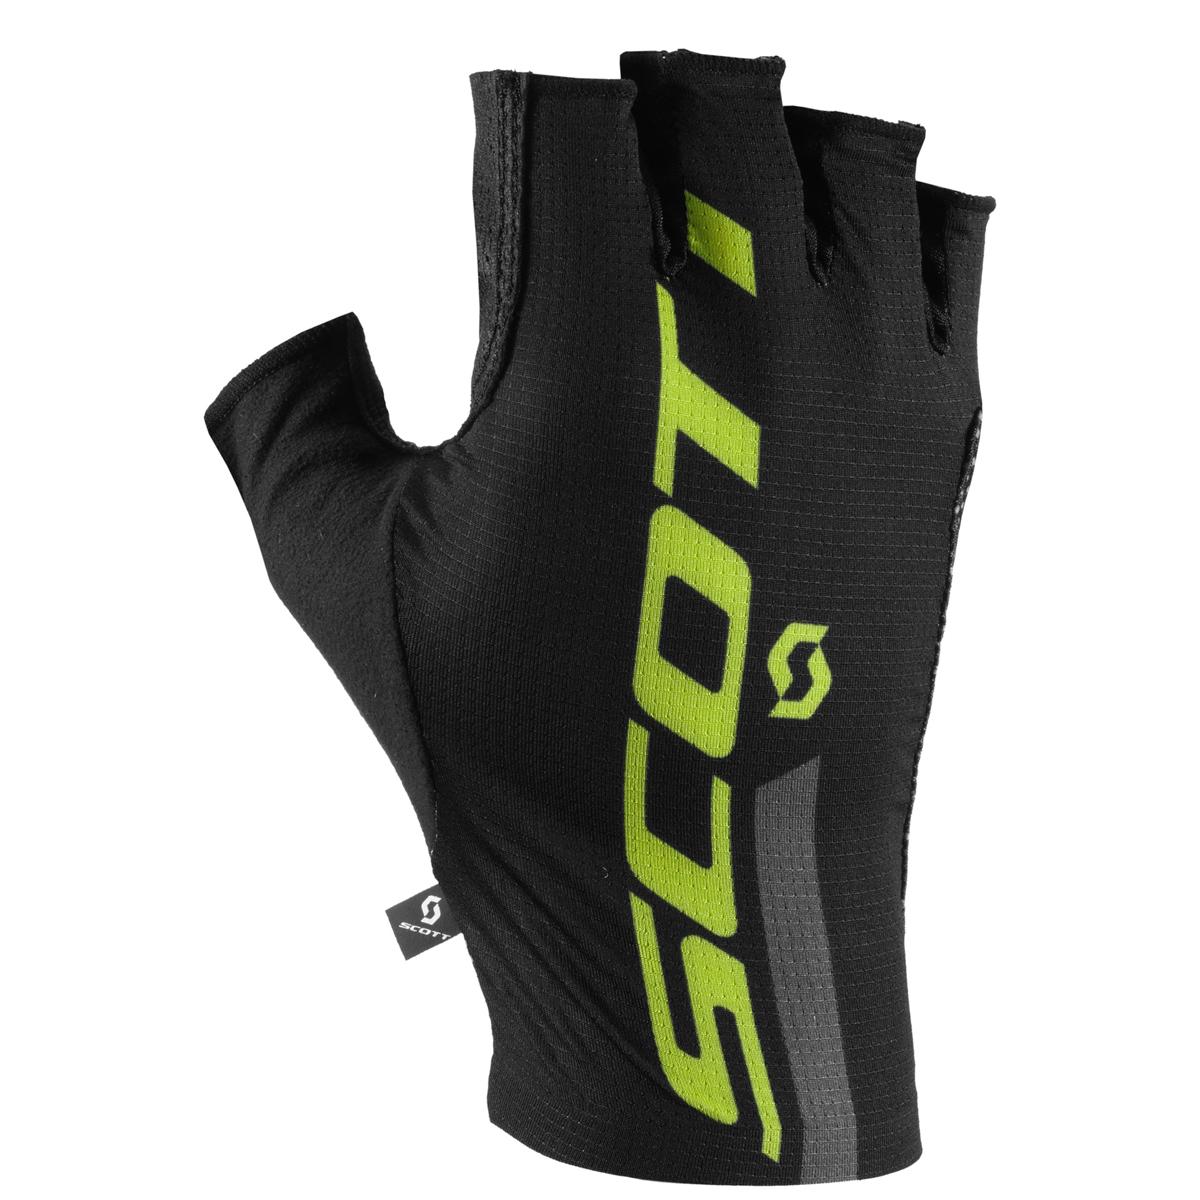 scott rc premium protec fahrrad handschuhe kurz schwarz. Black Bedroom Furniture Sets. Home Design Ideas